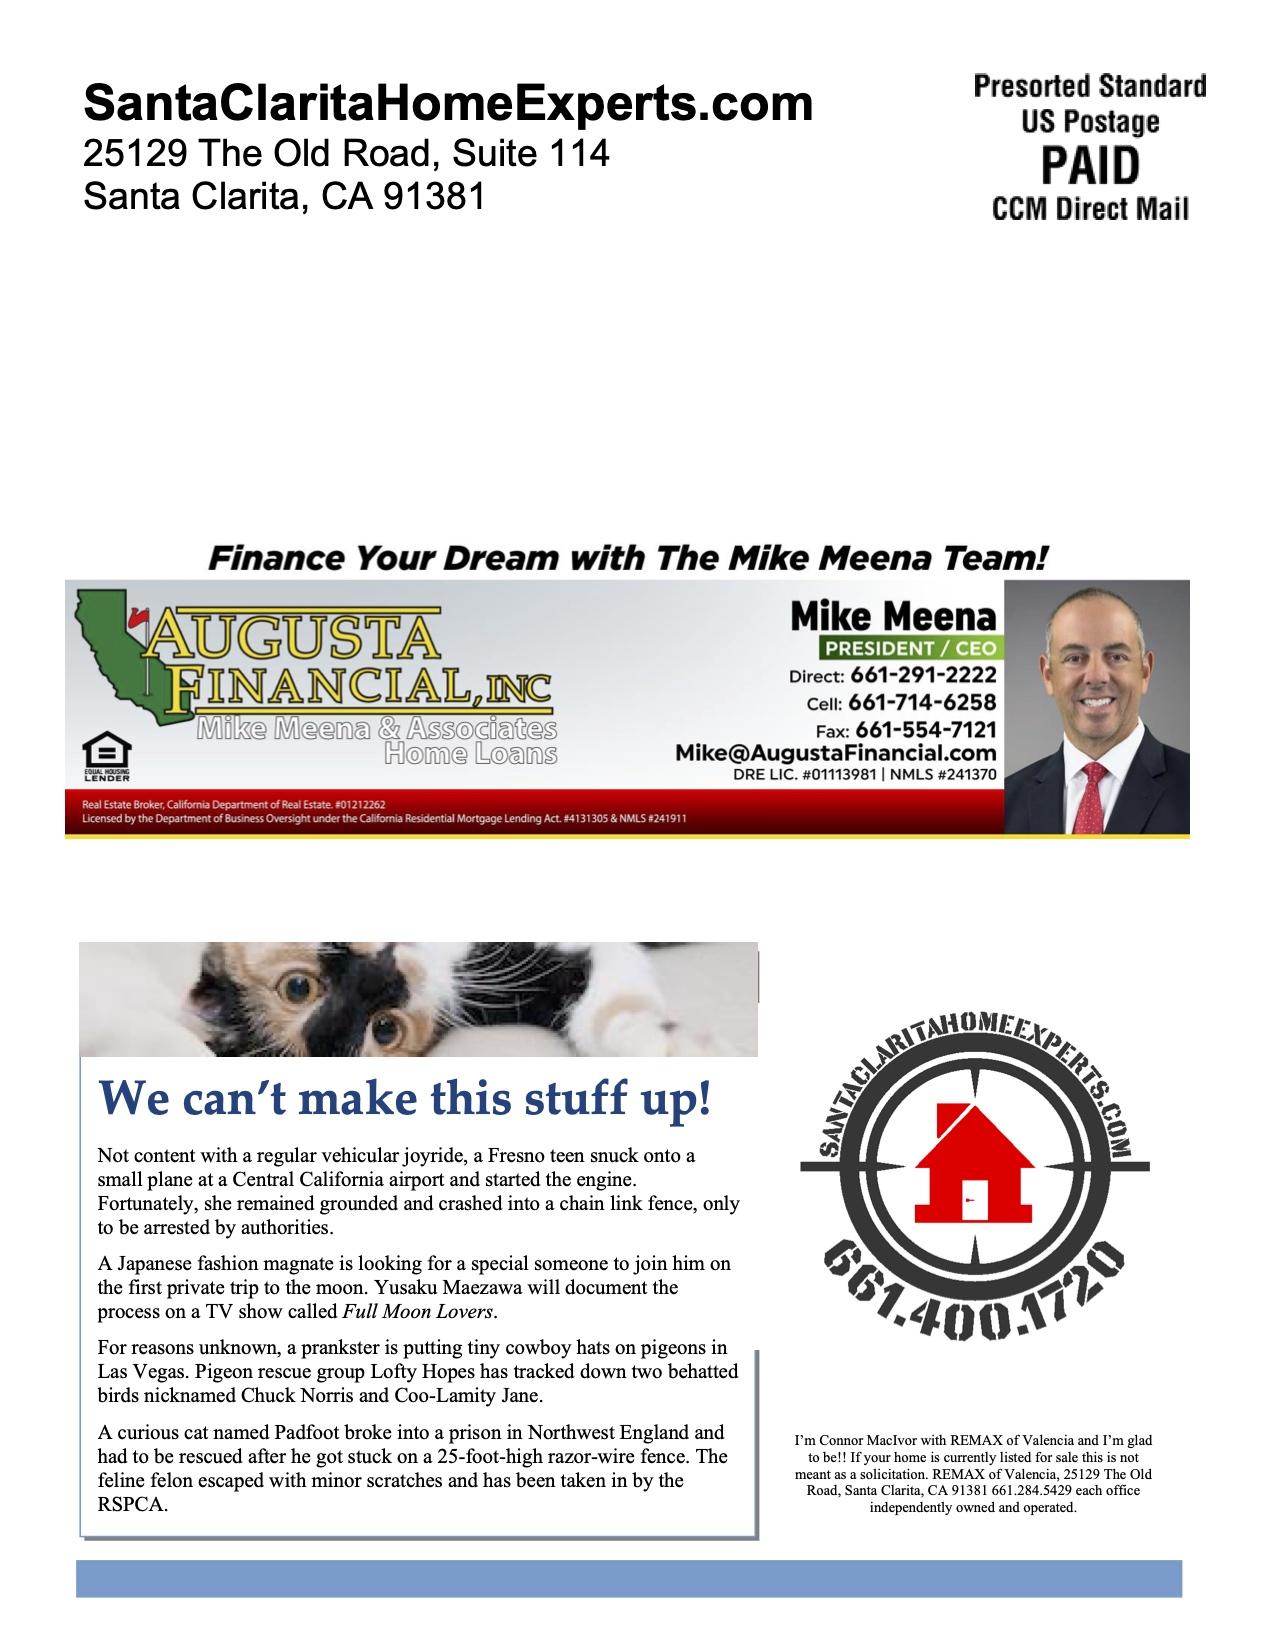 Santa Clarita news page 4